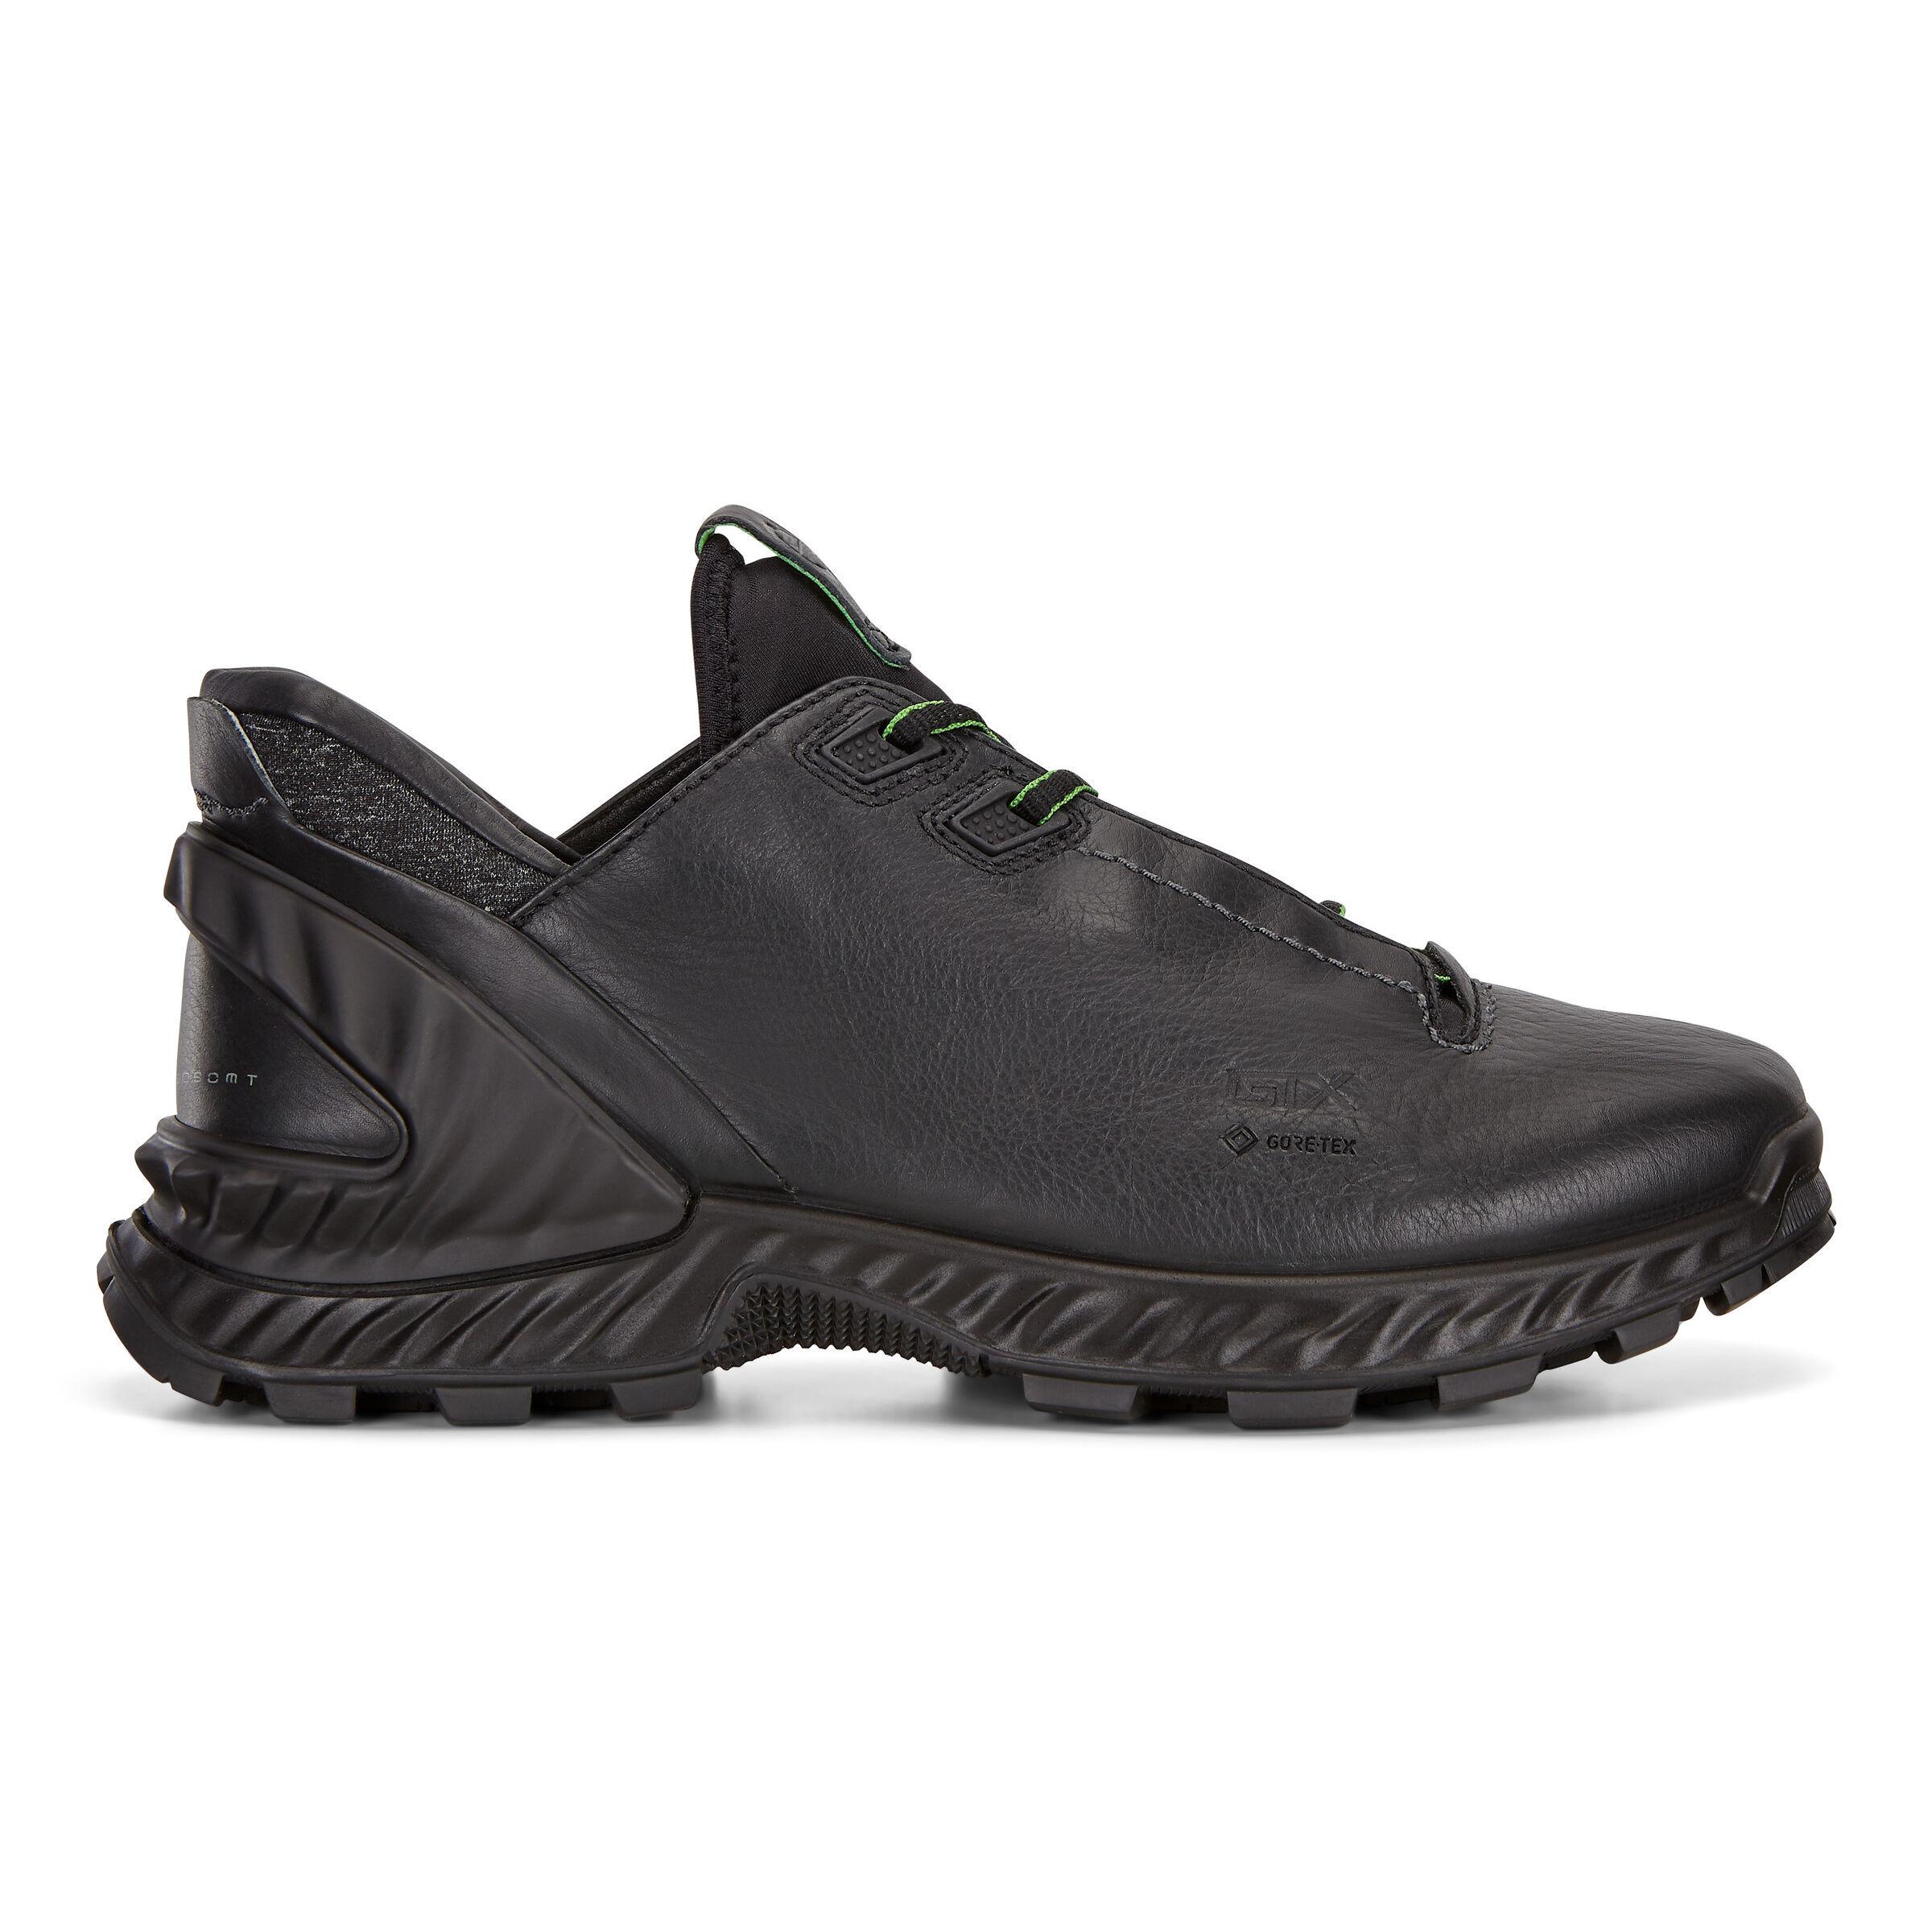 ECCO Exohike Mens Low GTX Shoes: 9 - Black